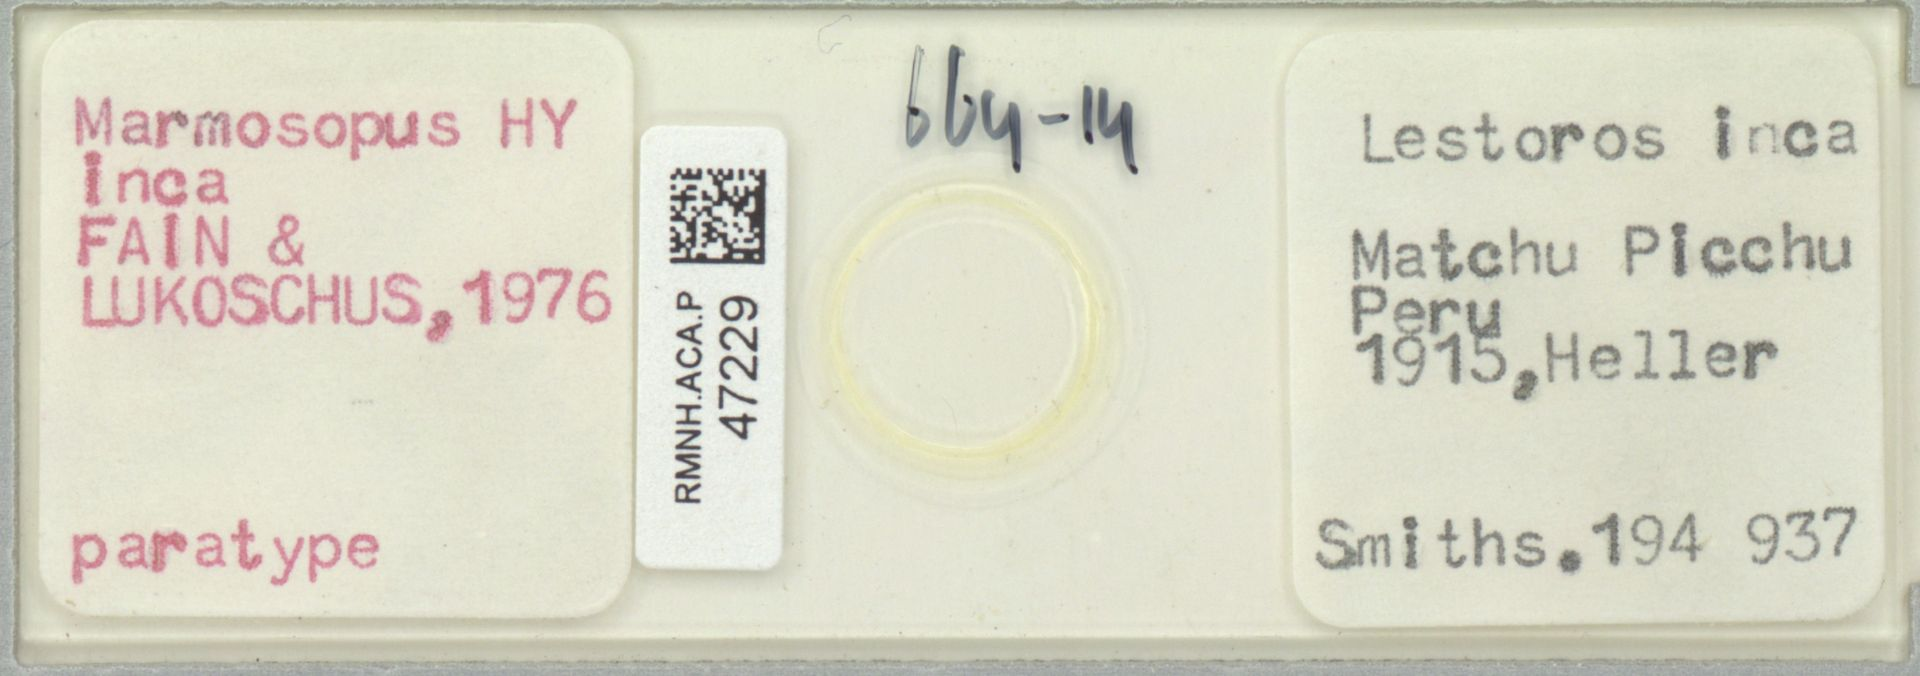 RMNH.ACA.P.47229 | Marmosopus inca Fain & Lukoschus,1976